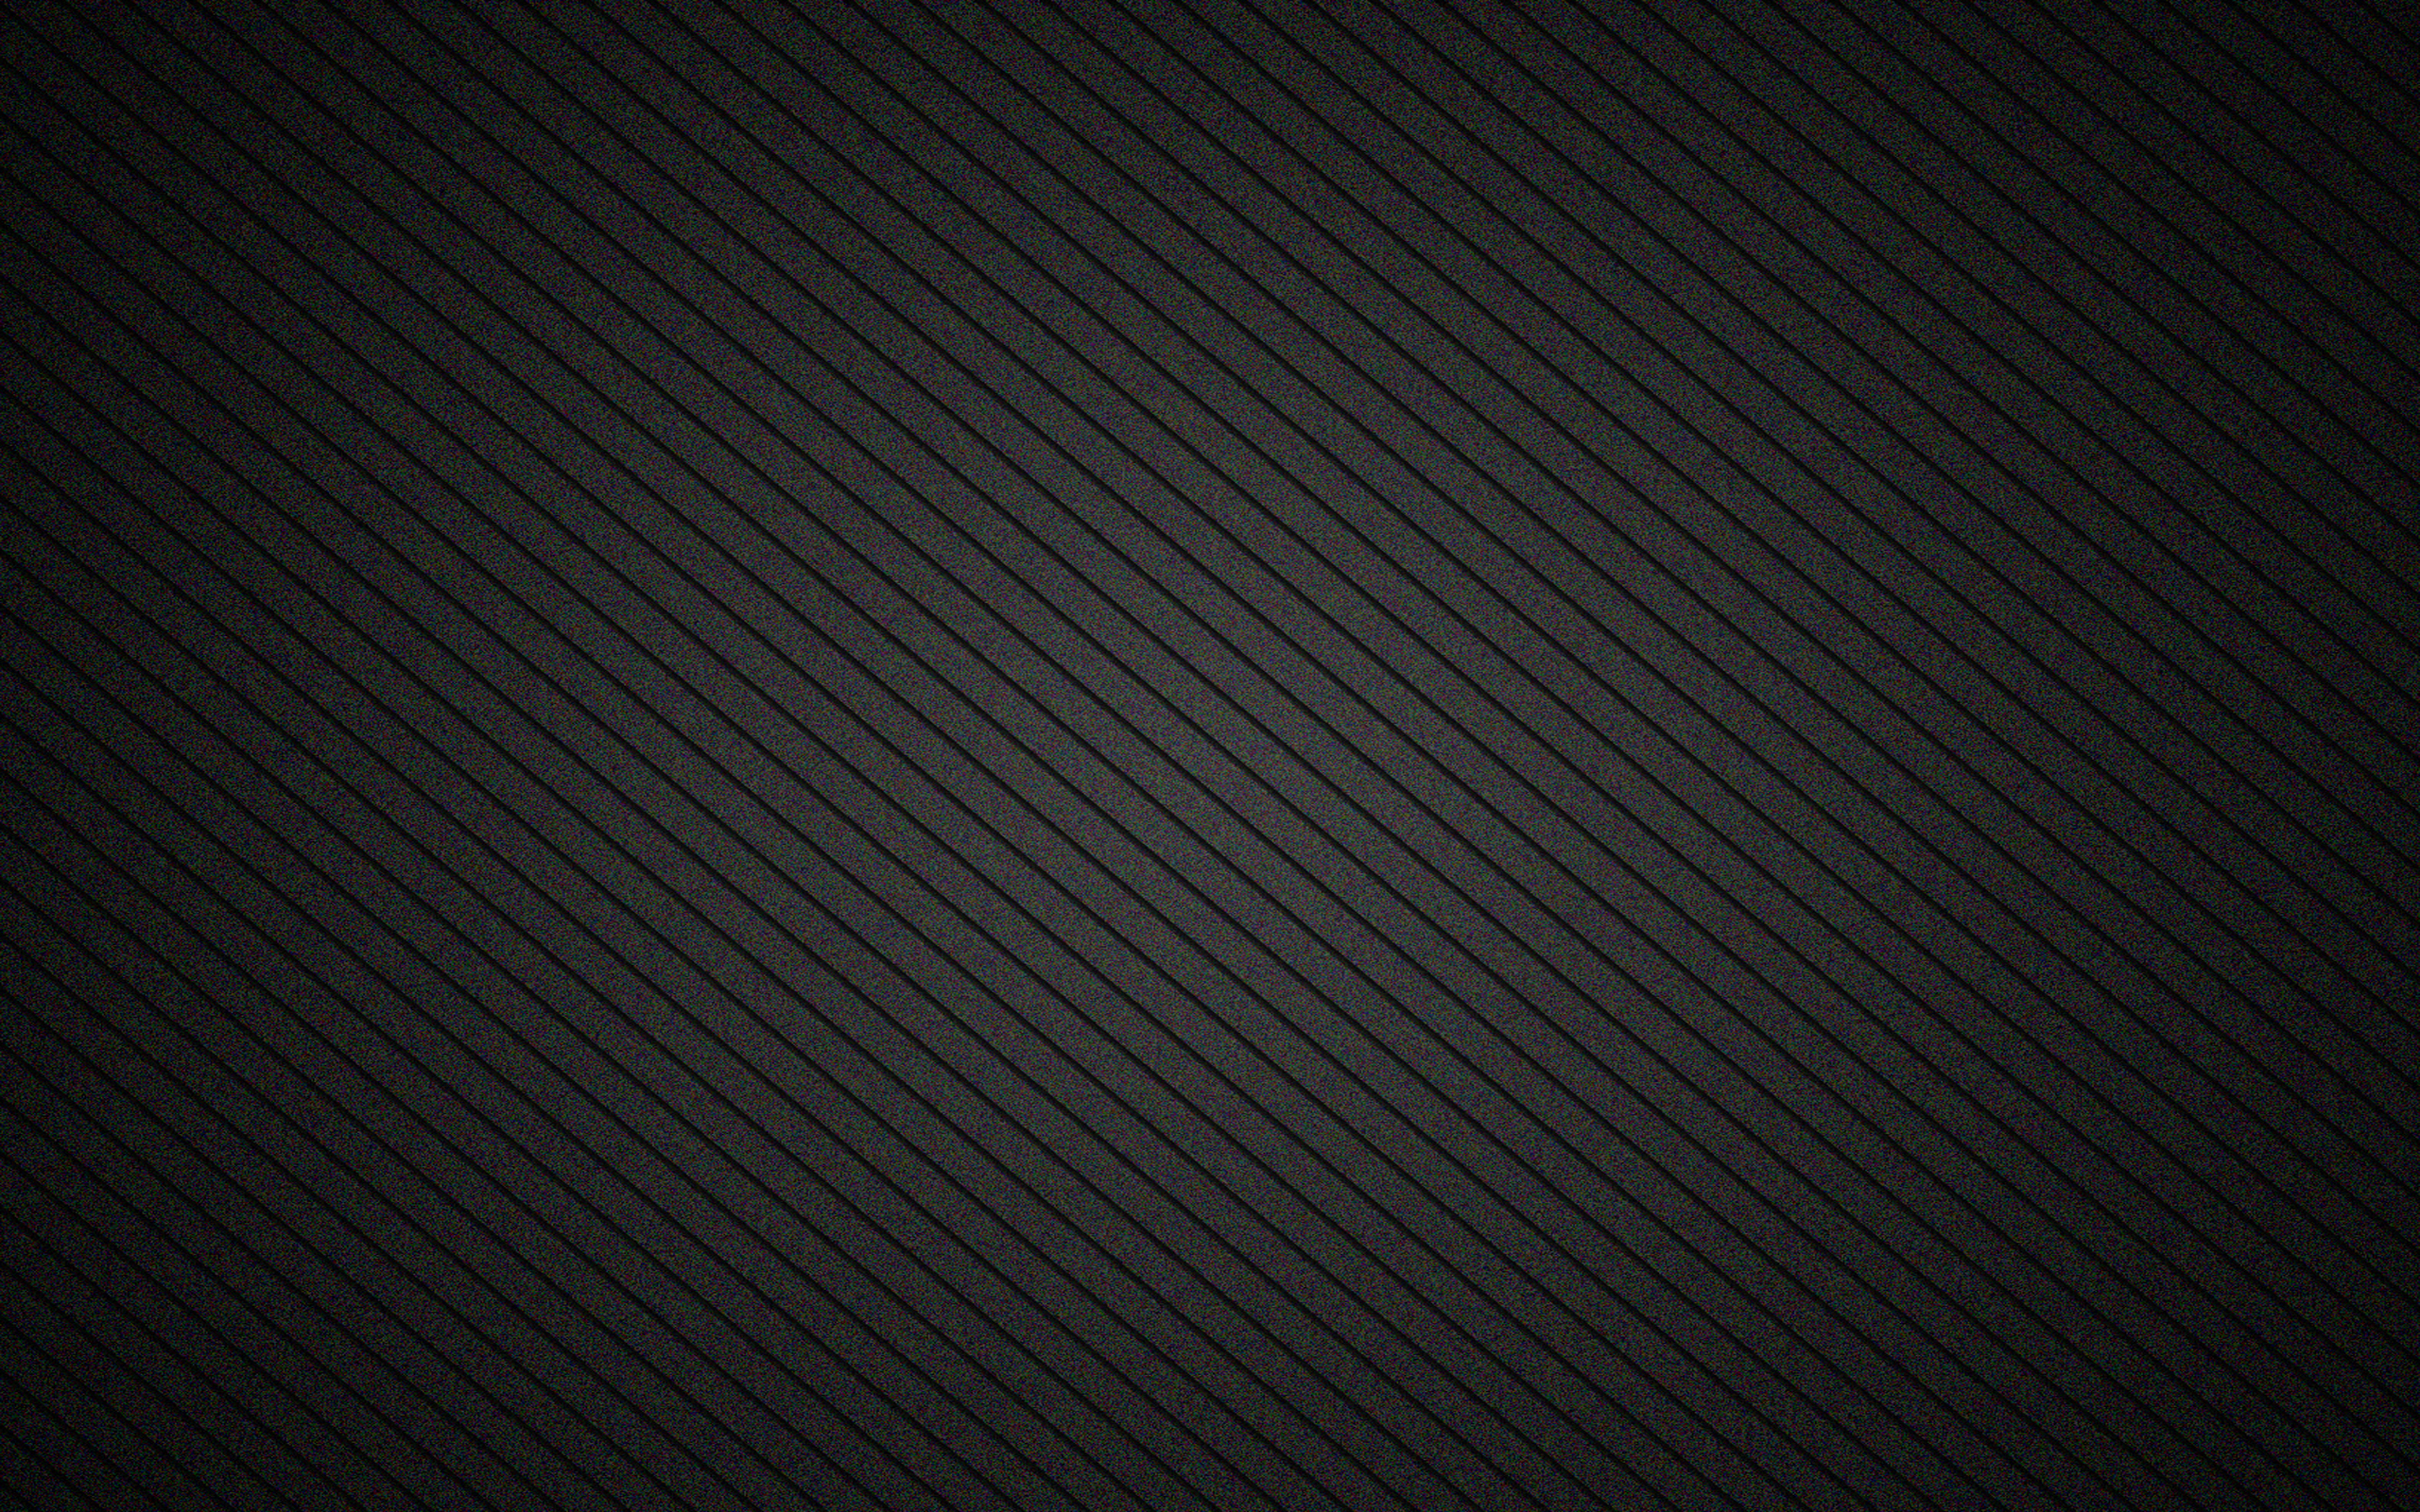 ws_Black_Lines_2560x1600(1)